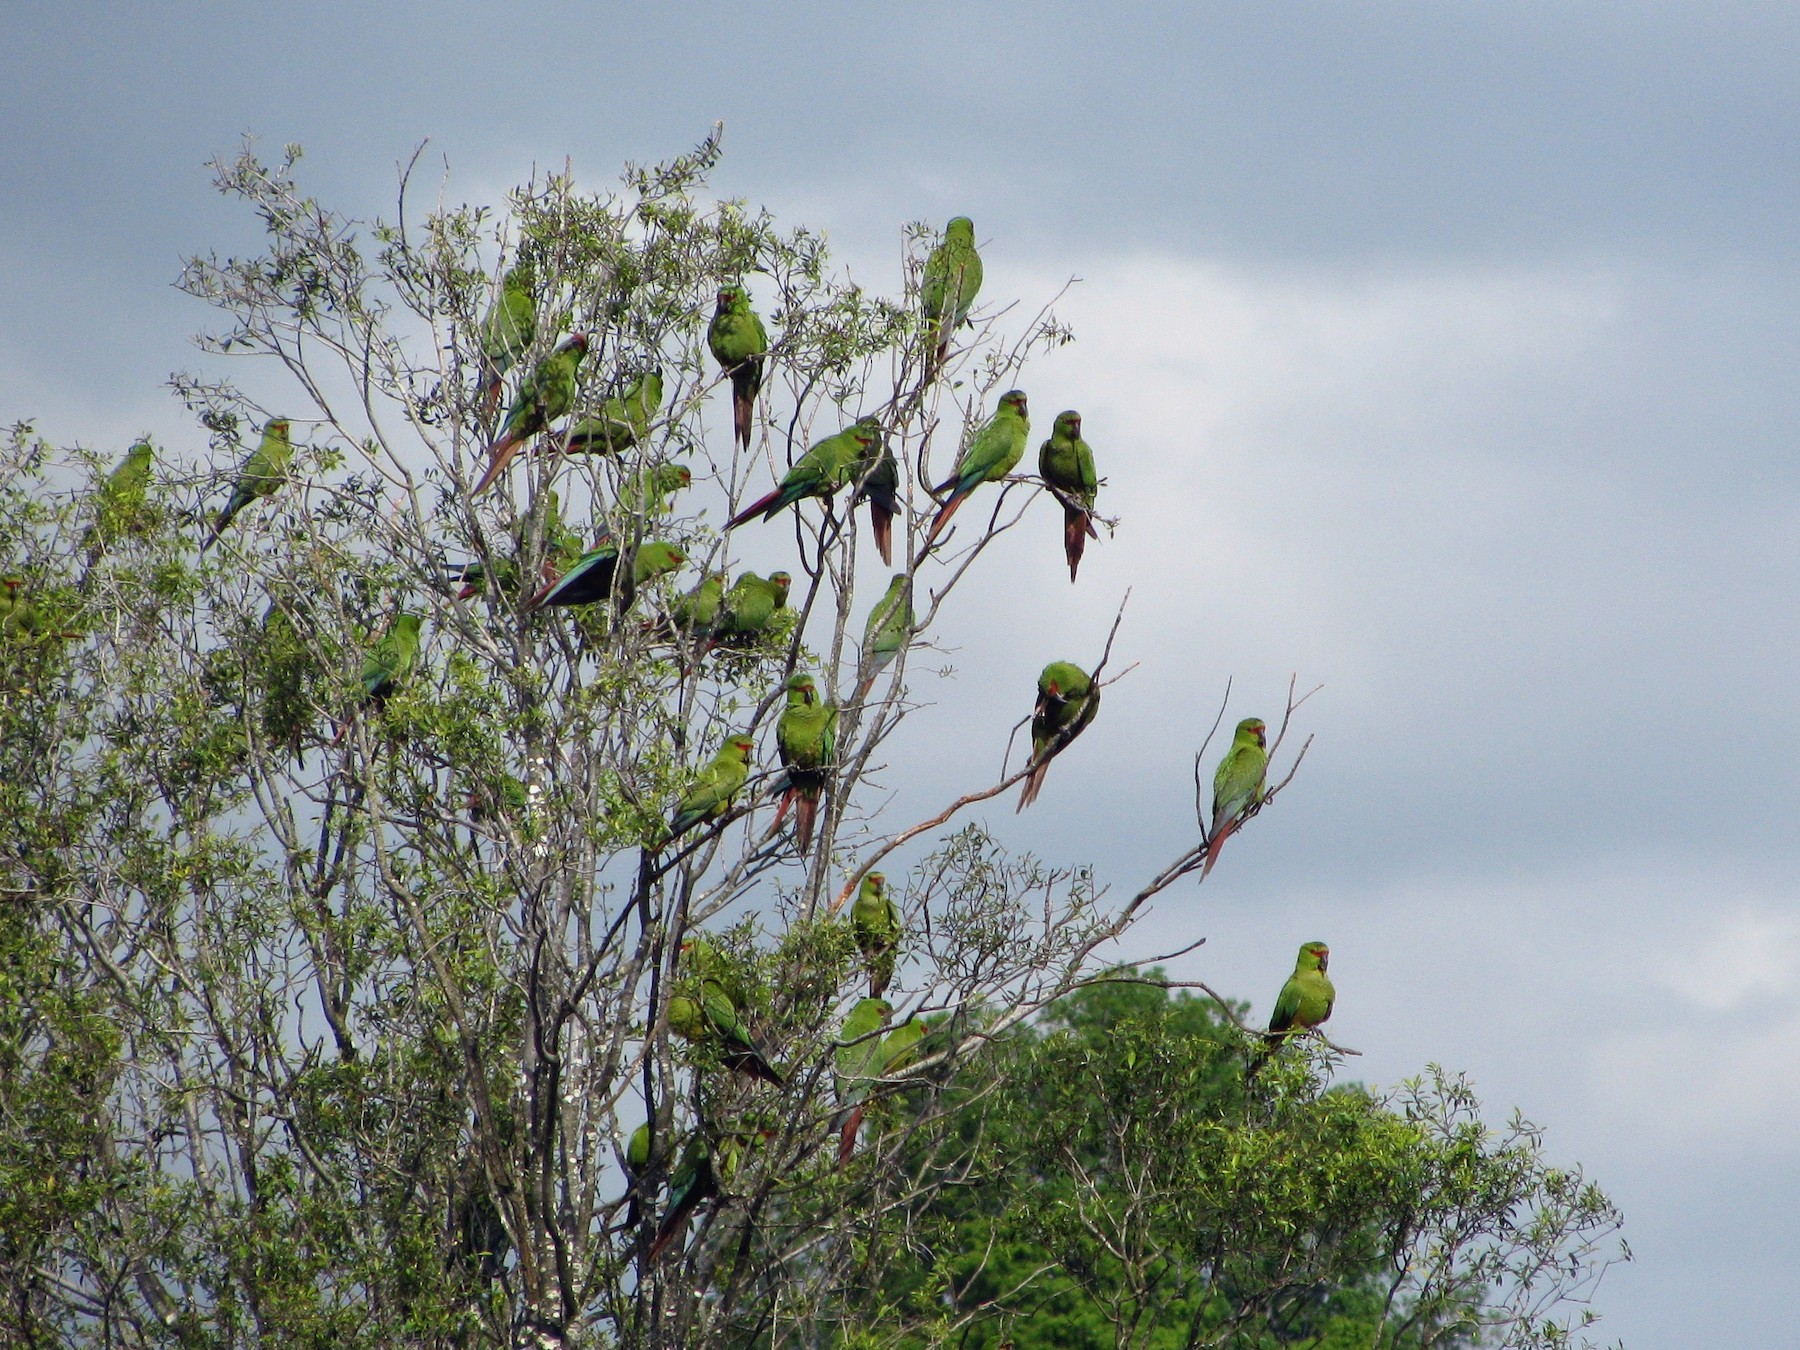 Slender-billed Parakeet - Shawn Billerman